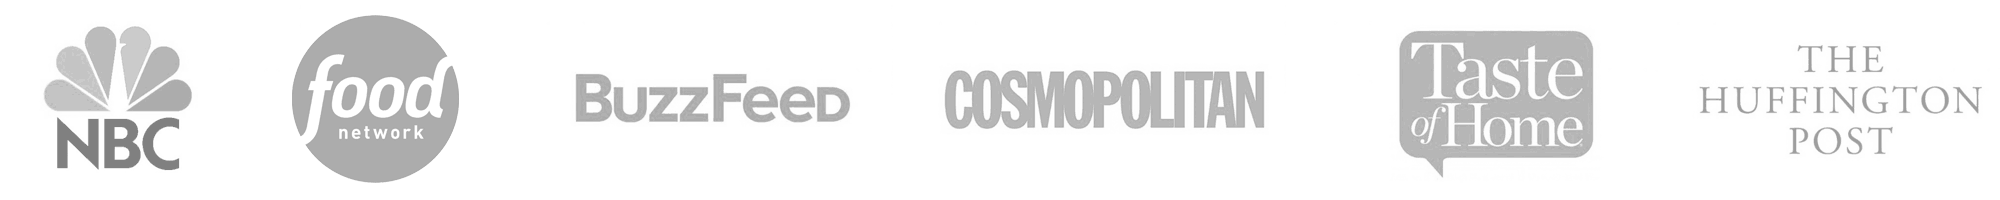 Logos: NBC, Food Network, BuzzFeed, Cosmopolitan, Taste of Home, HuffPost